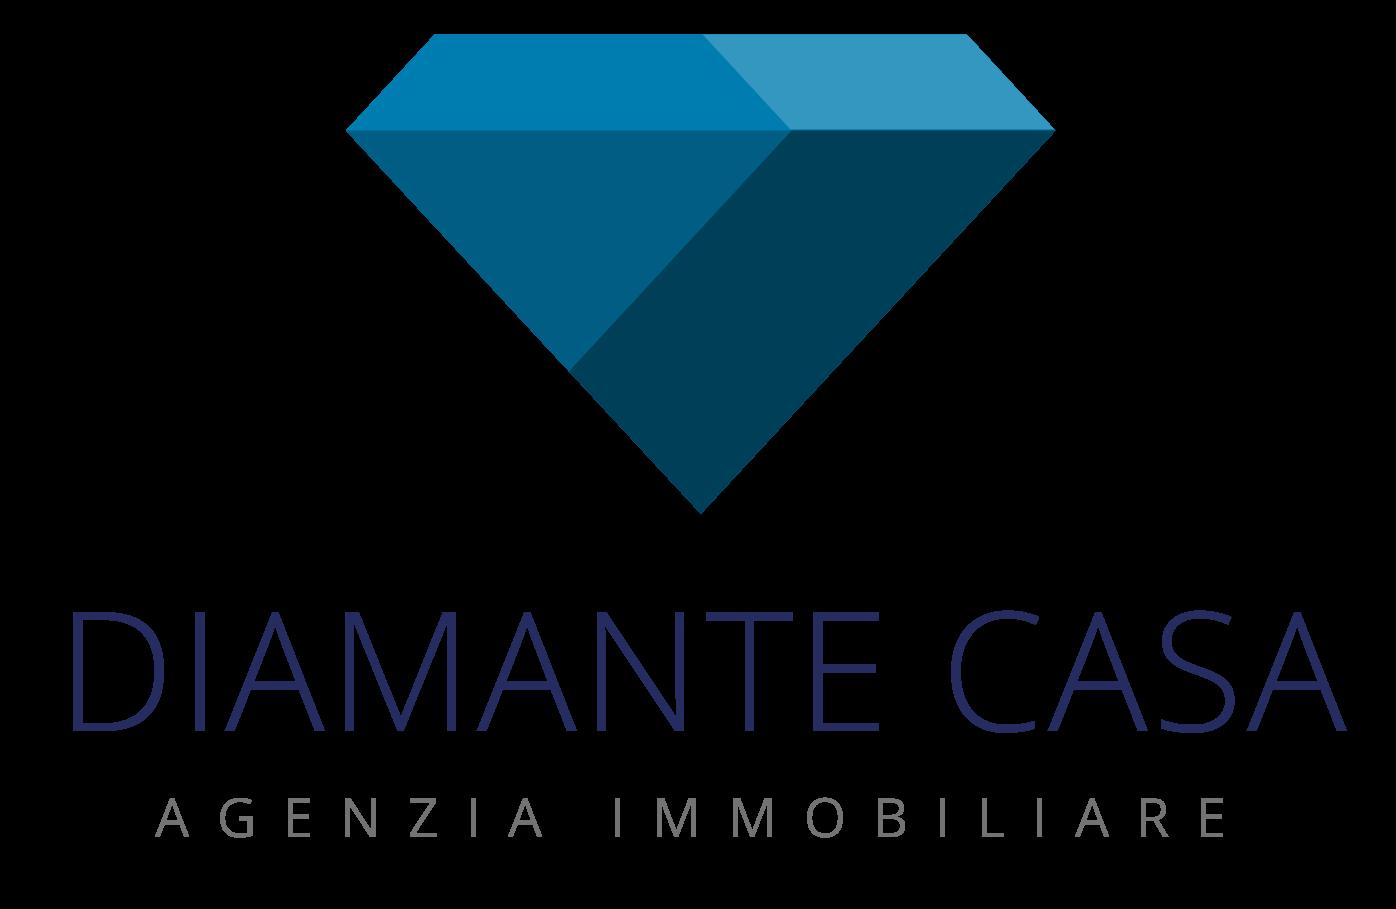 DIAMANTE CASA S.R.L.